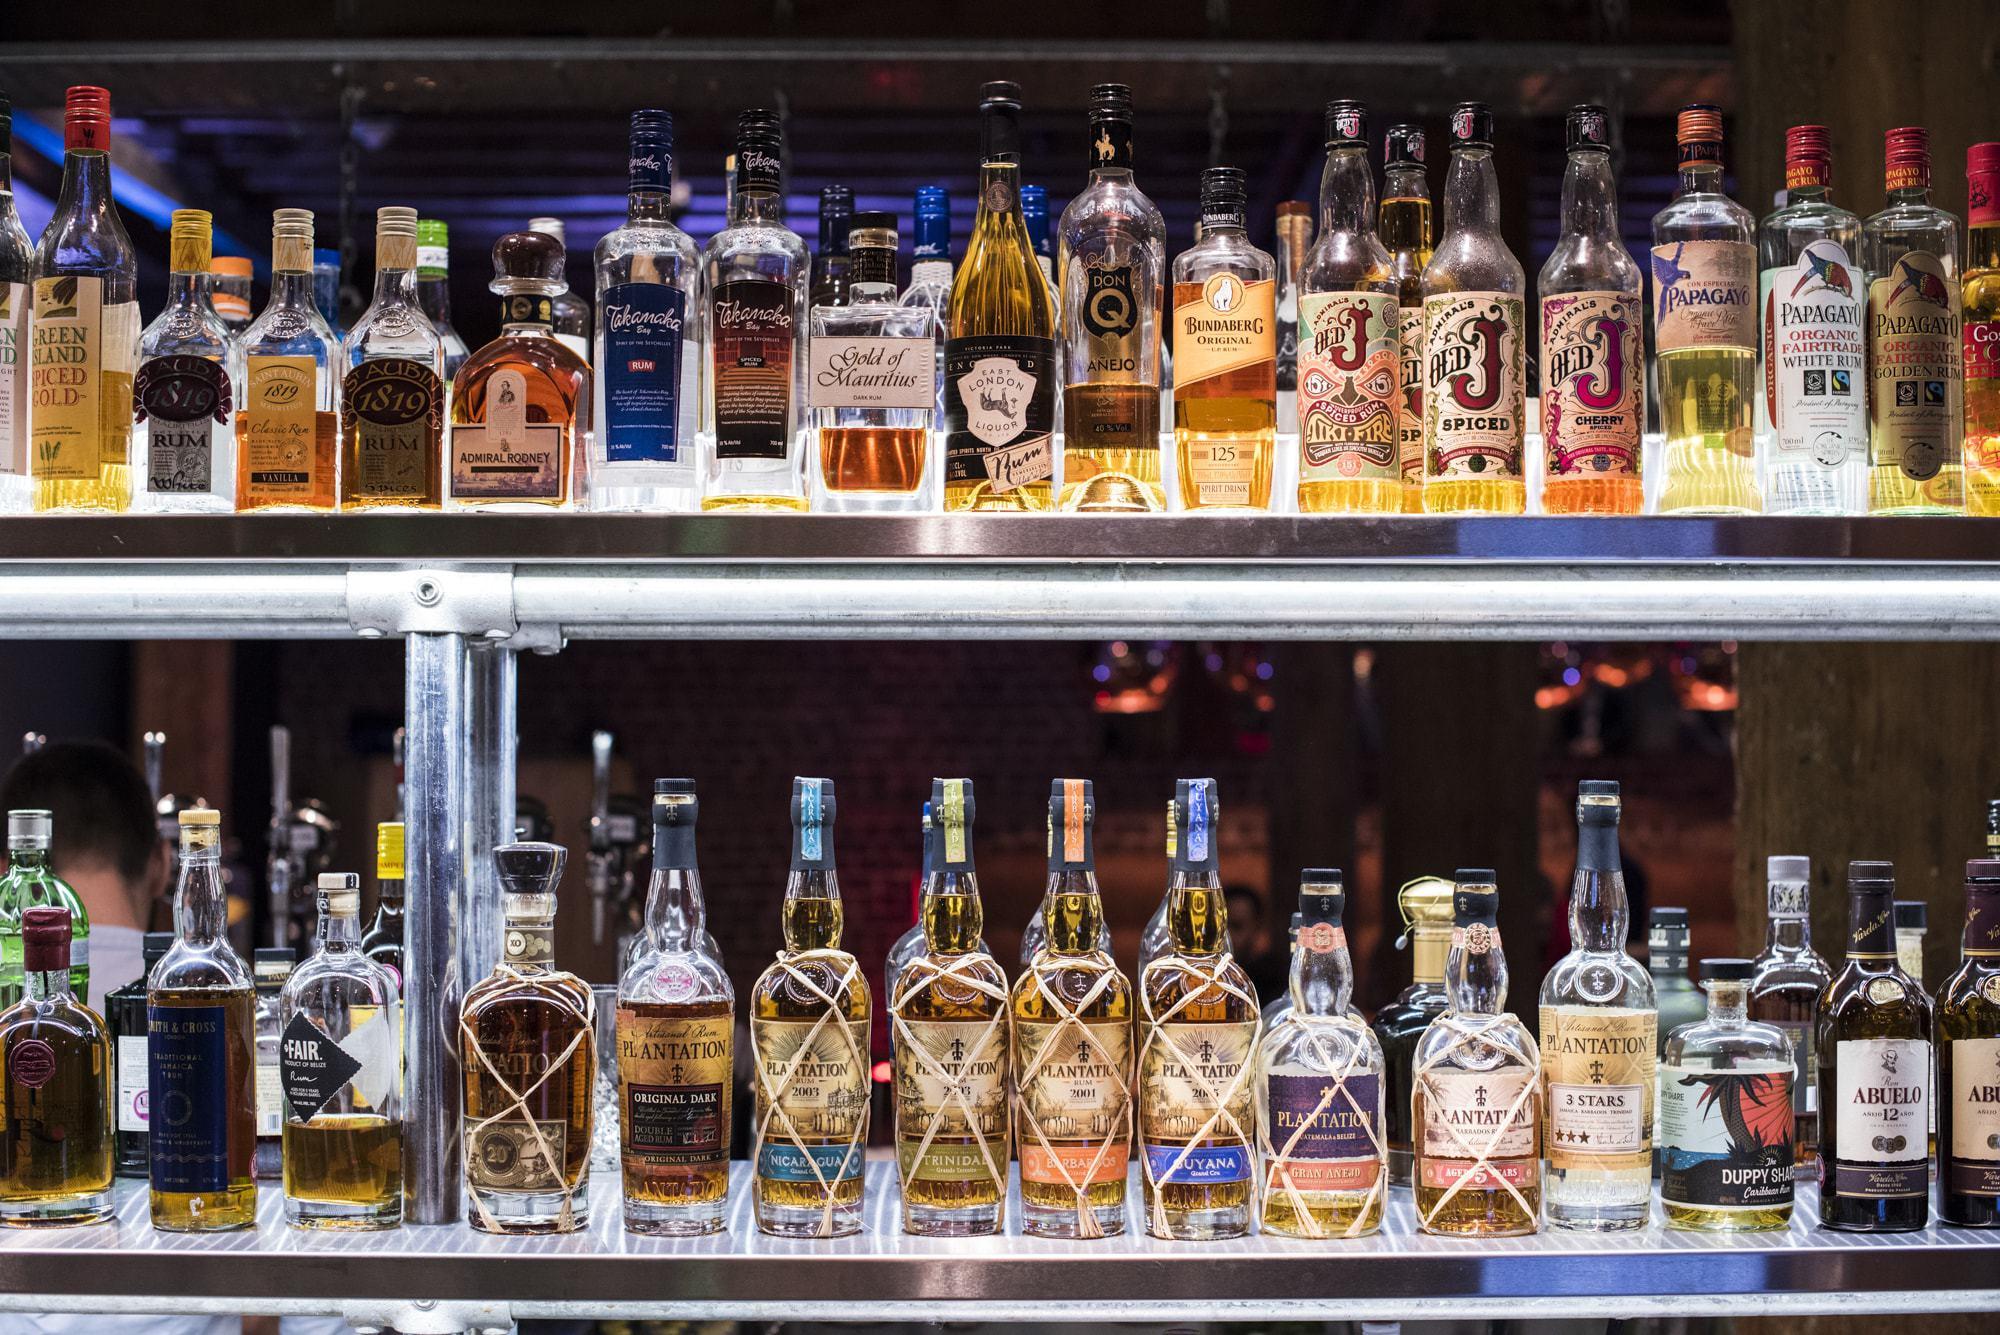 Rum & Sugar | Cocktail bar & bar west India quay Canary Wharf